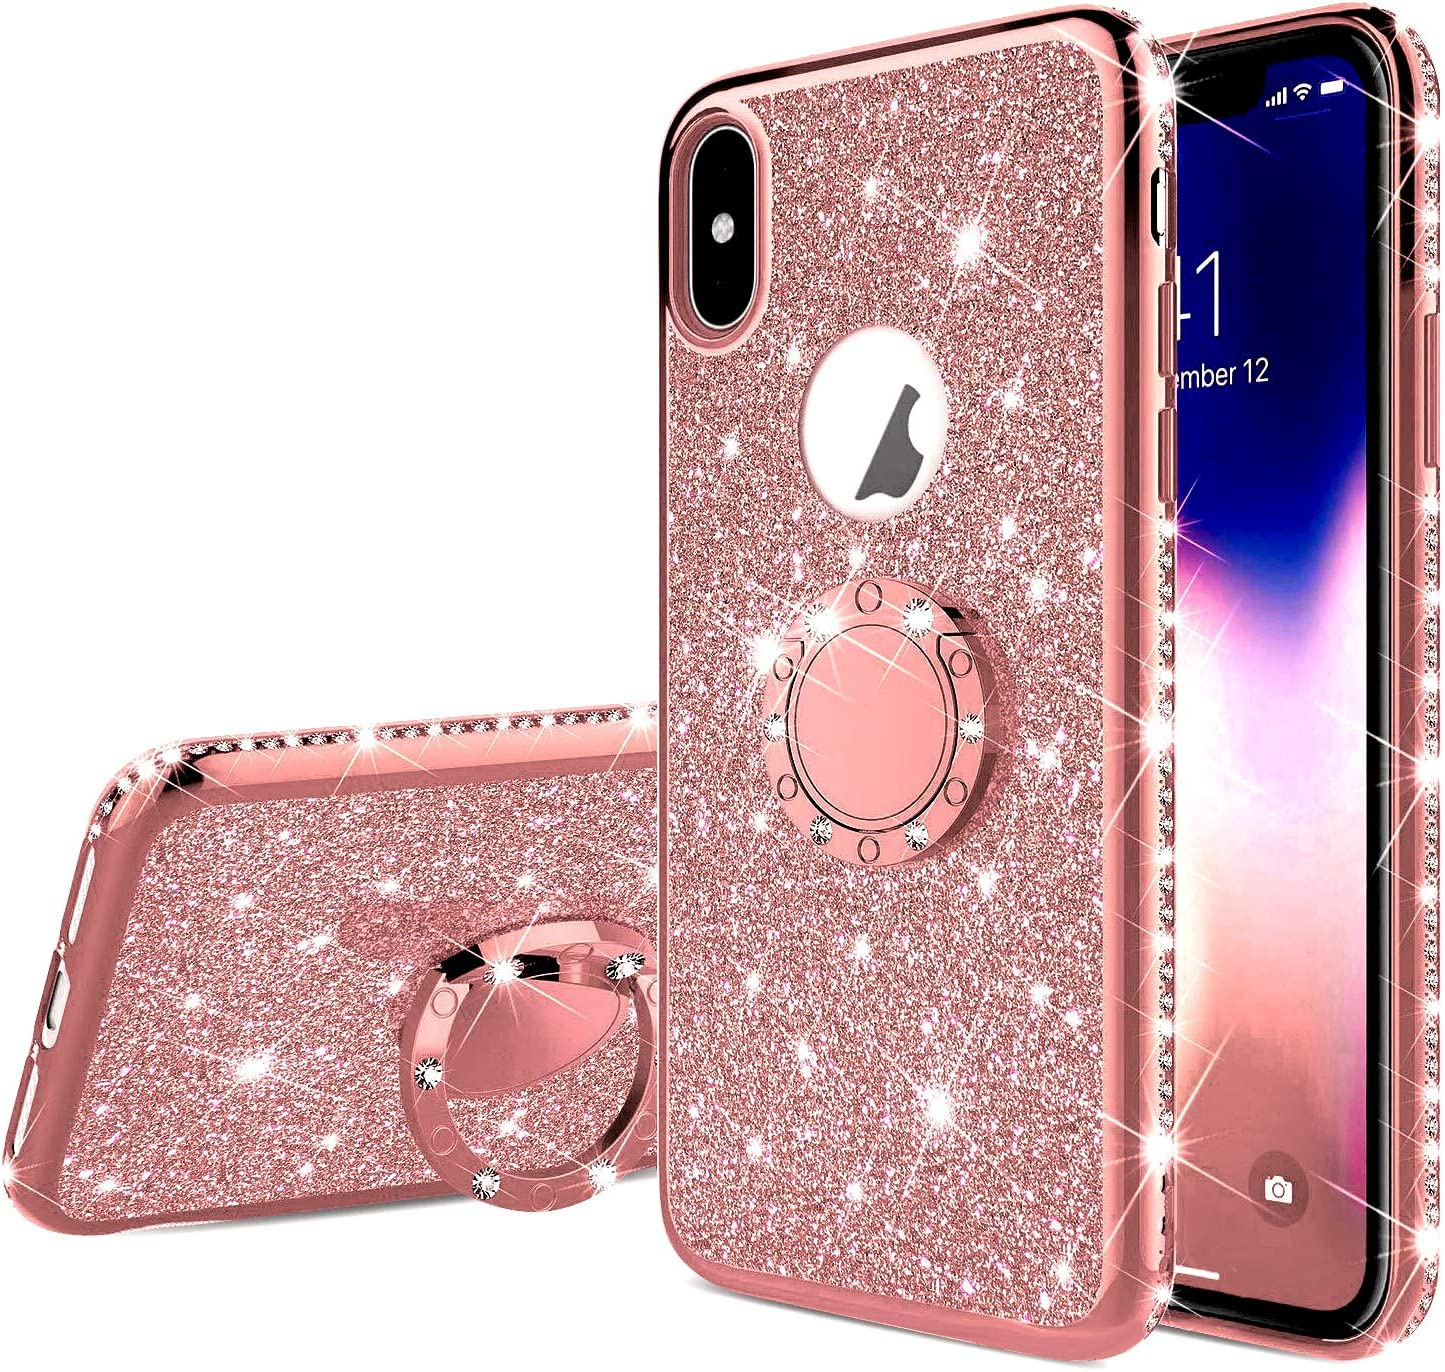 Coque iPhone XR Superbe A Paillettes diamant 3D support support téléphone transparente iphone MAX samsung S8 S9 S10 E Note cover